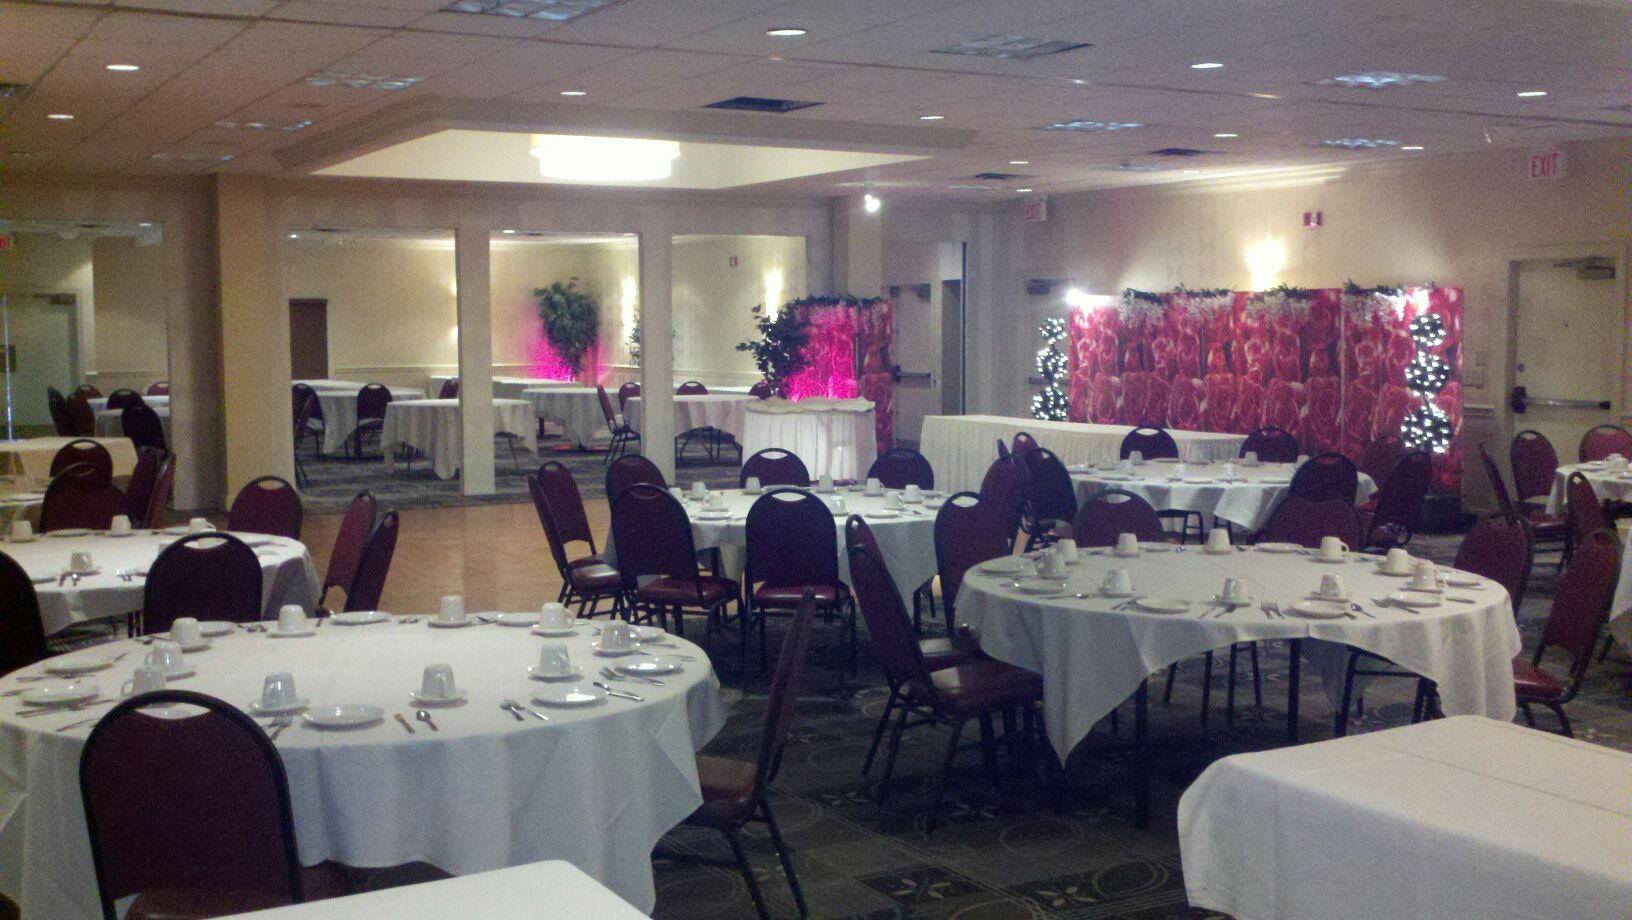 Undos Catering hall in West Virginia using art print room divider